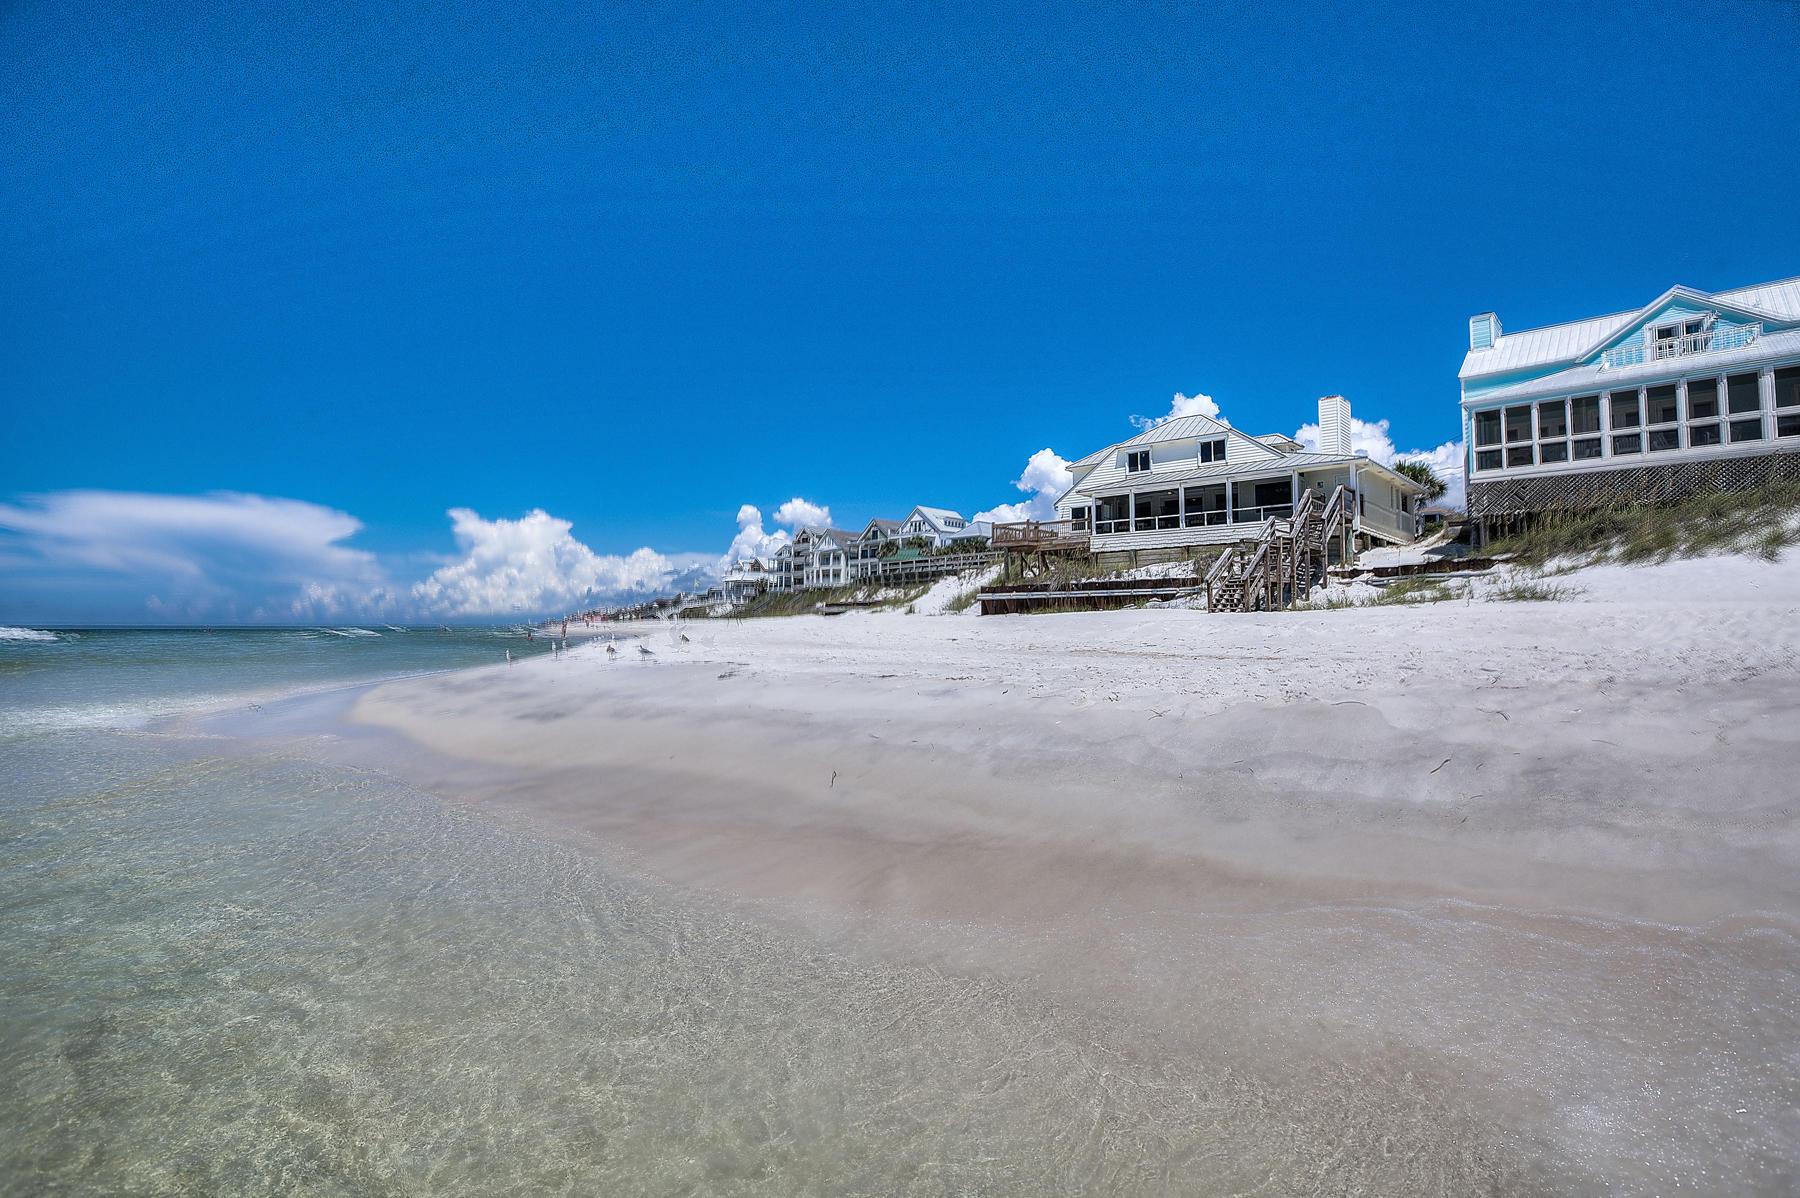 325 Pompano,Inlet Beach,Florida 32461,4 Bedrooms Bedrooms,2 BathroomsBathrooms,Detached single family,Pompano,20131126143817002353000000